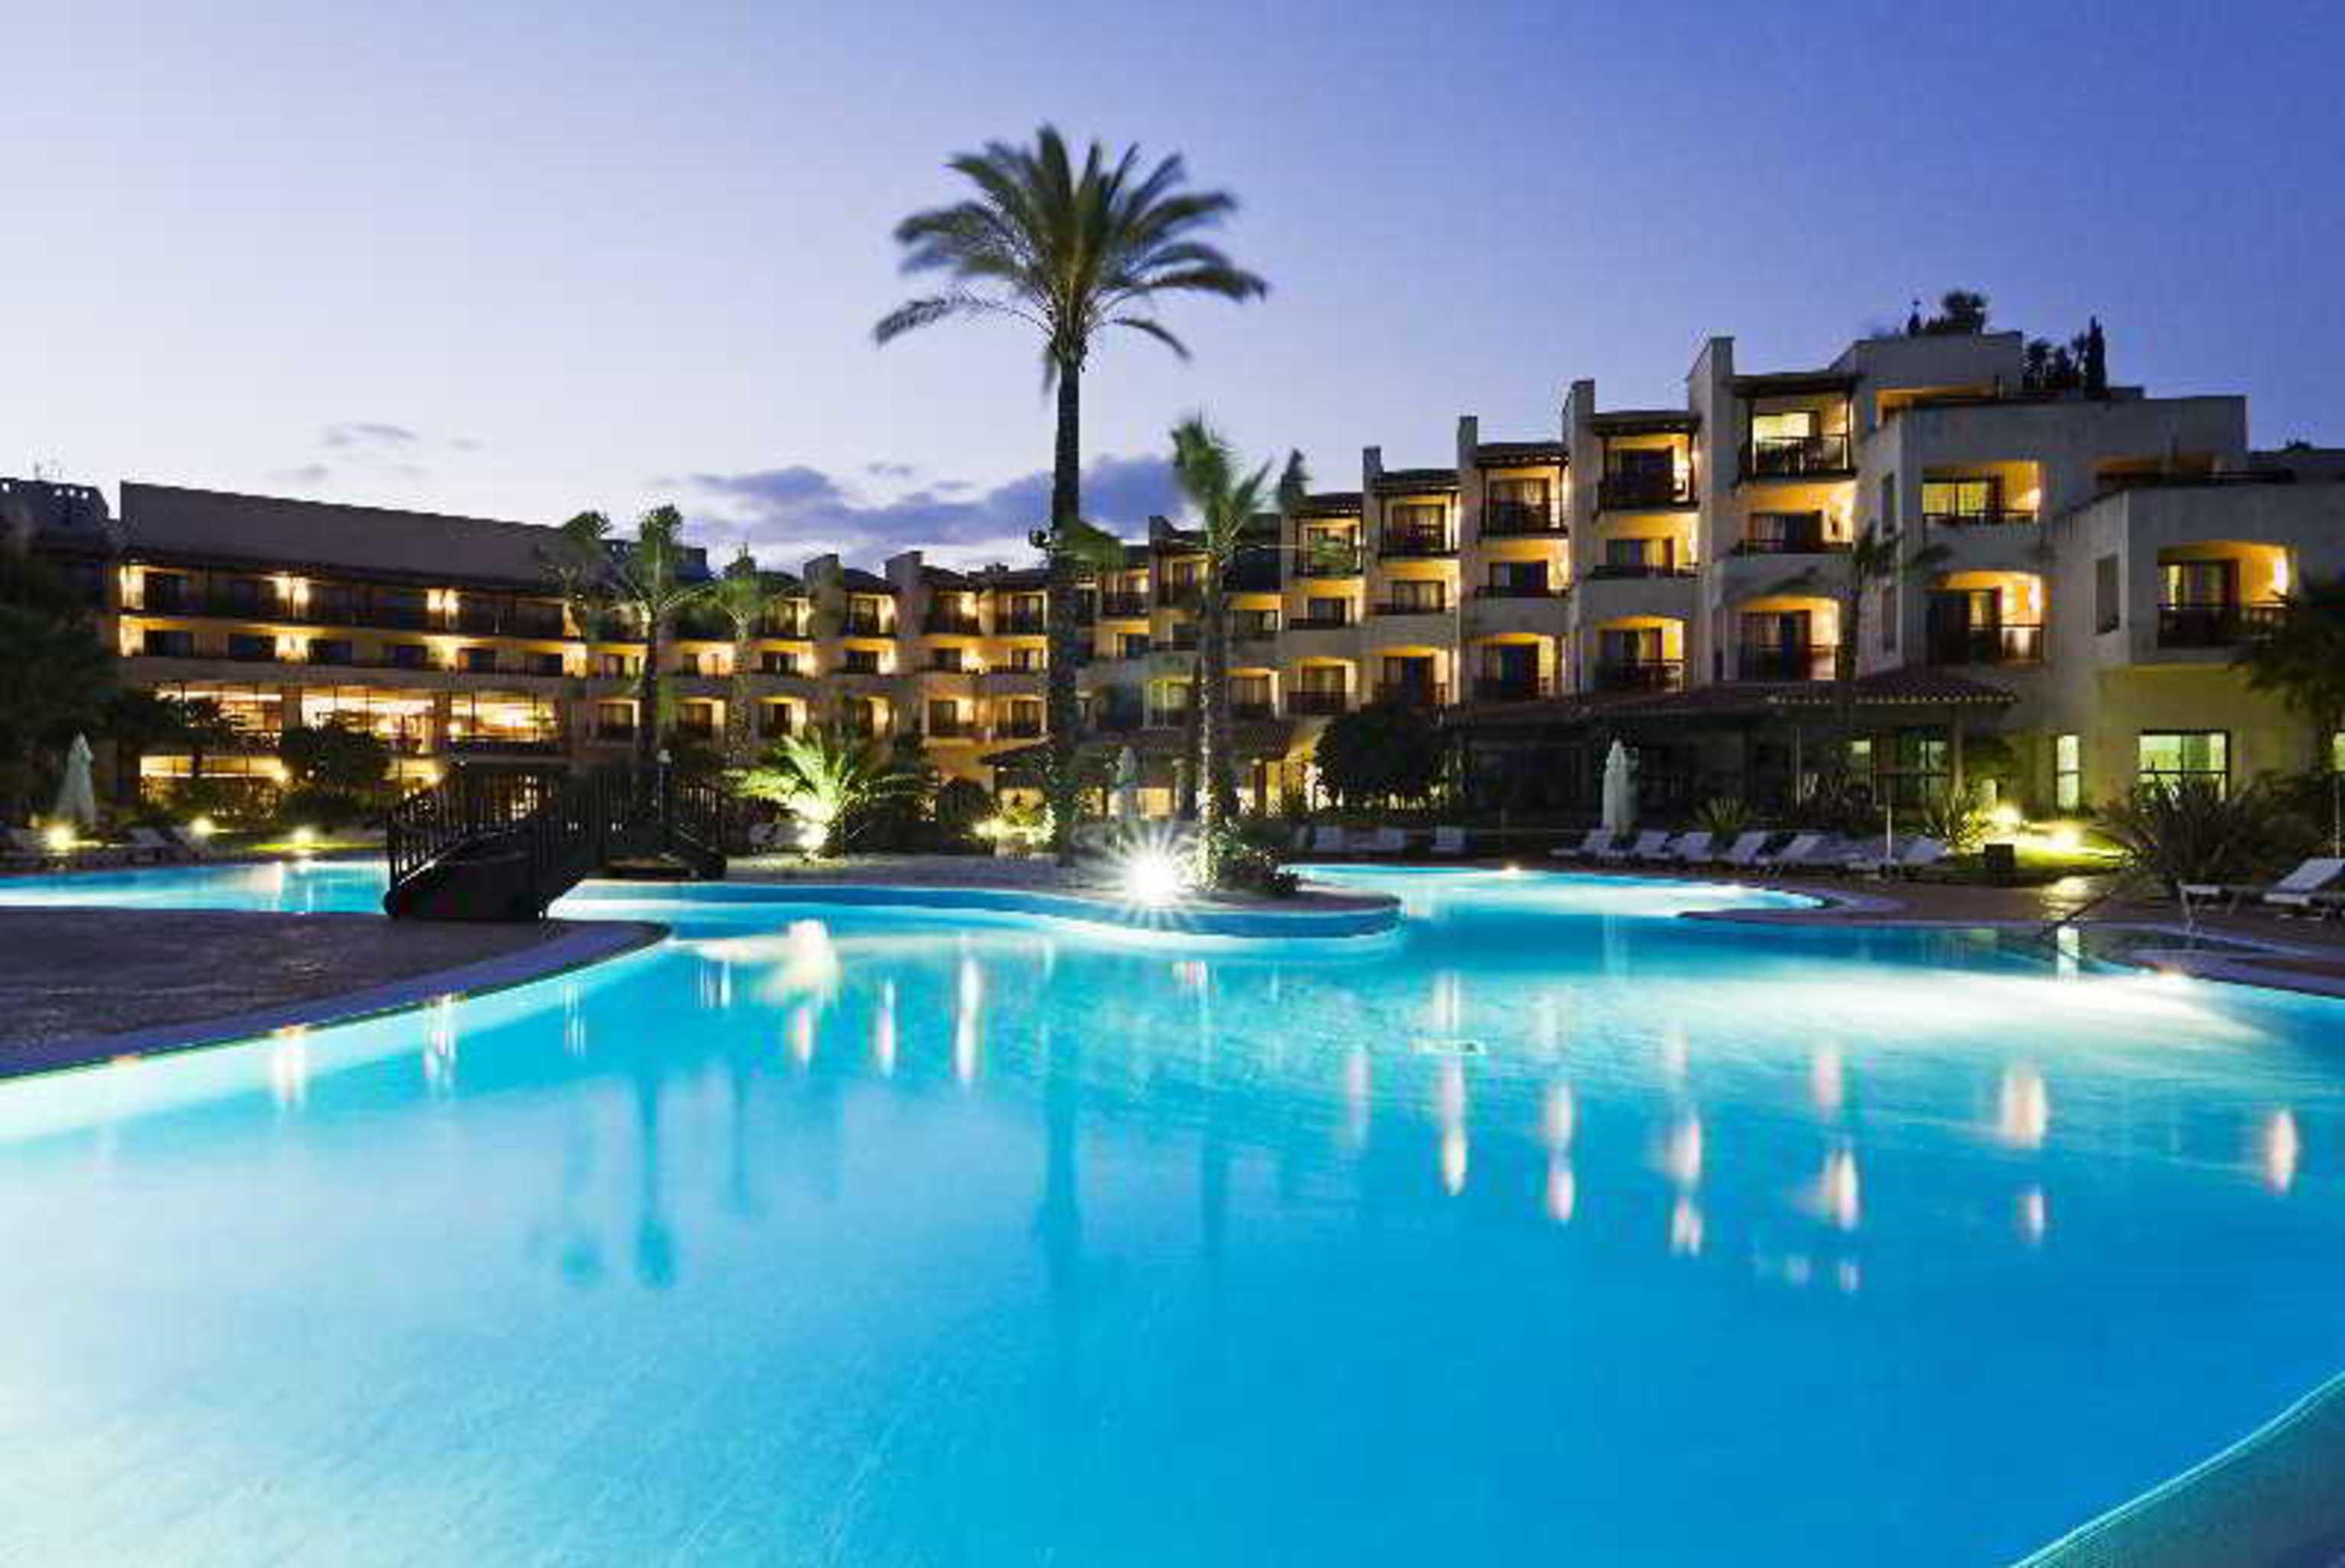 Precise Golf Resort El Rompido The Hotel, Huelva